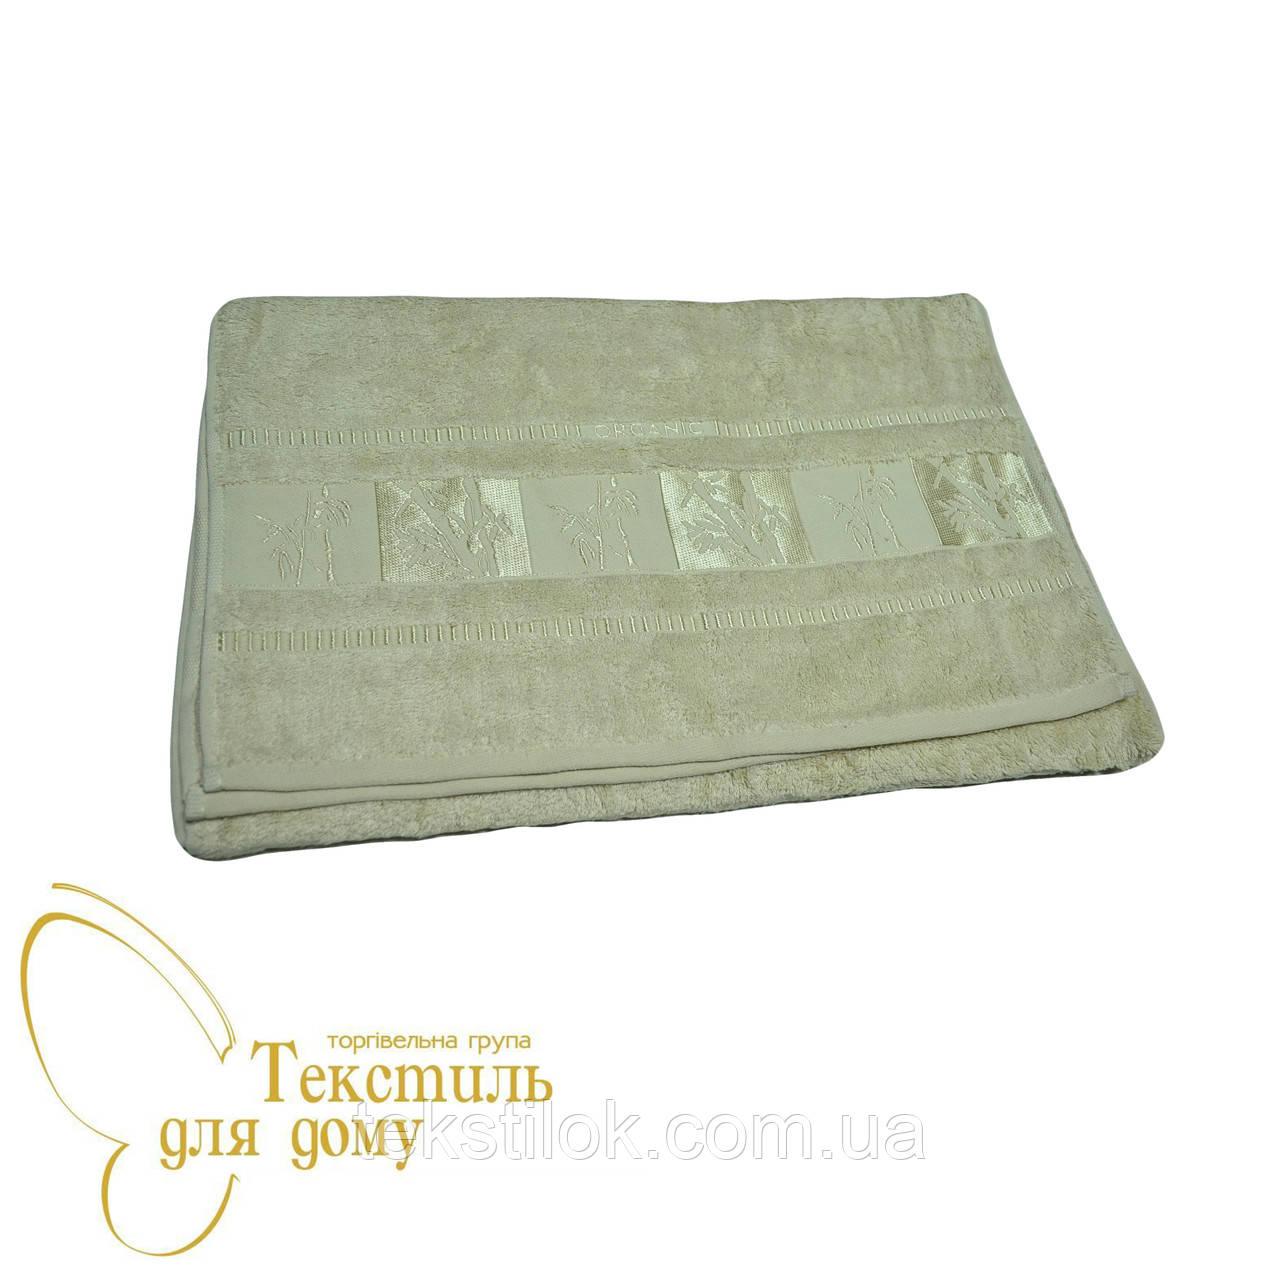 Полотенце лицевое 50*90, Бамбук, олива